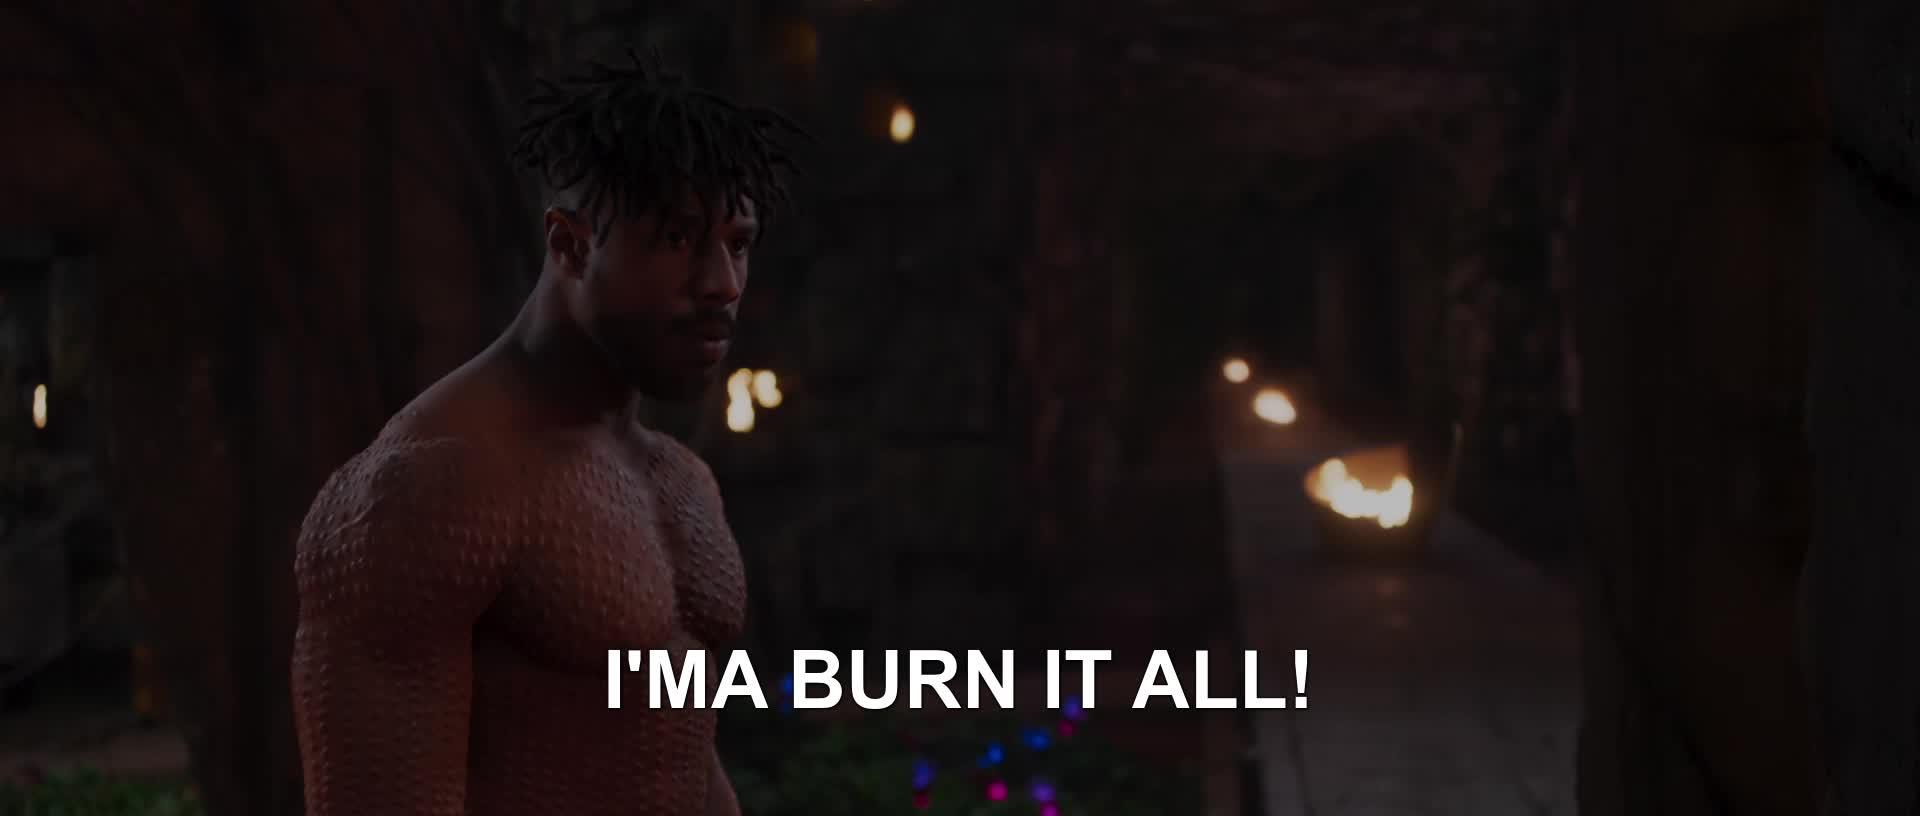 black panther, marvel, mcu, movie, new, Burn it all GIFs